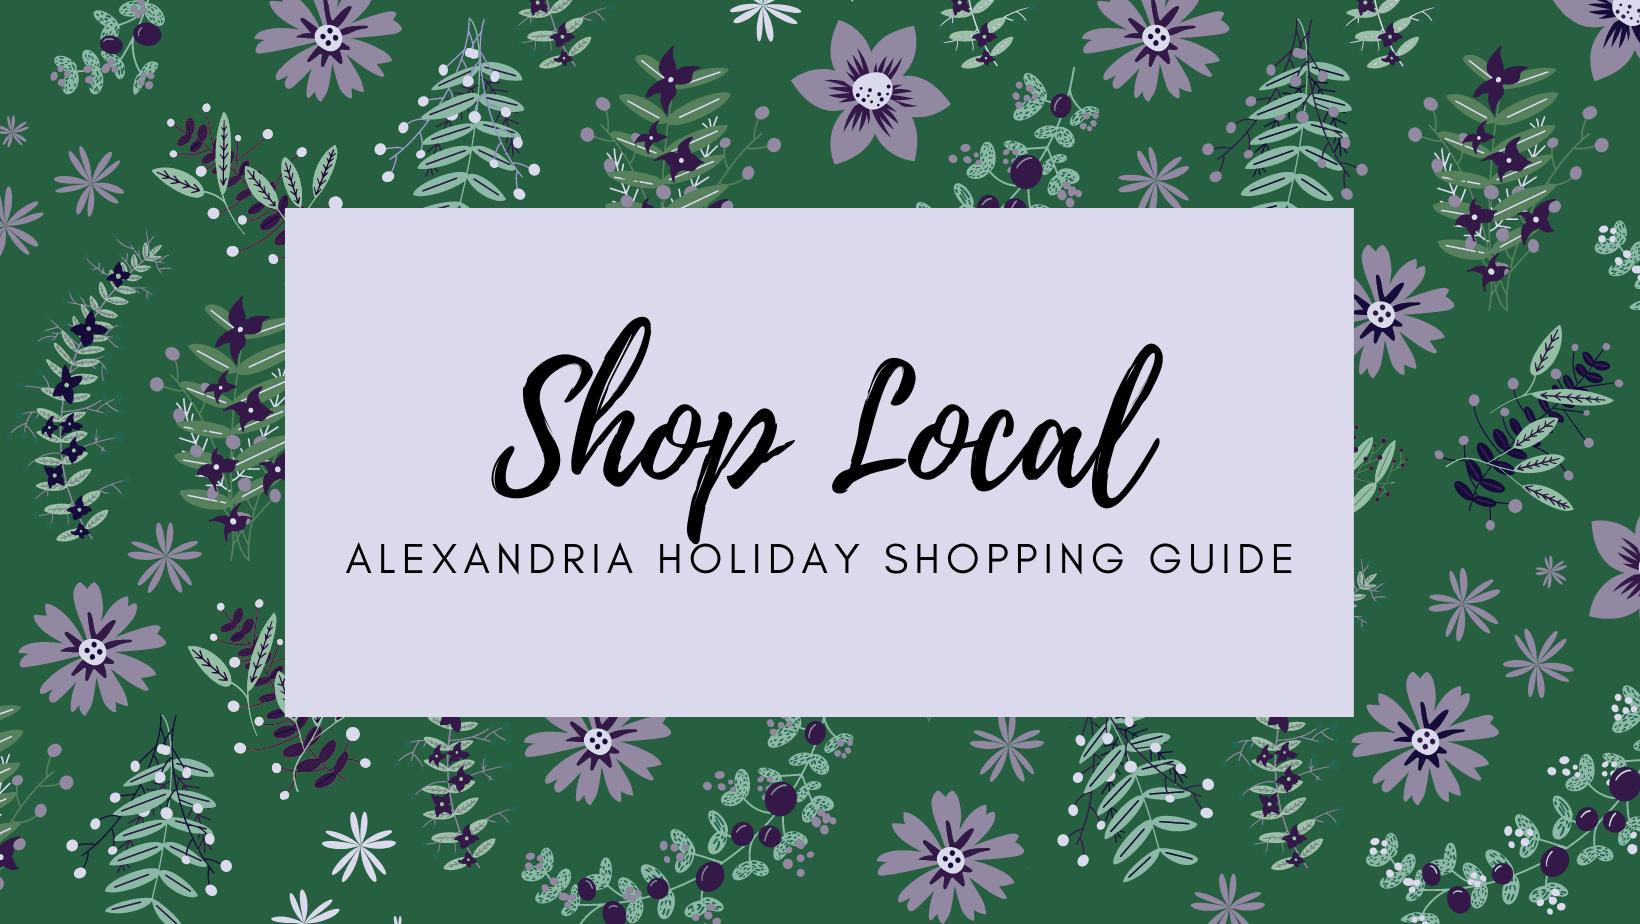 Shop Local - Alexandria Holiday Shopping Guide